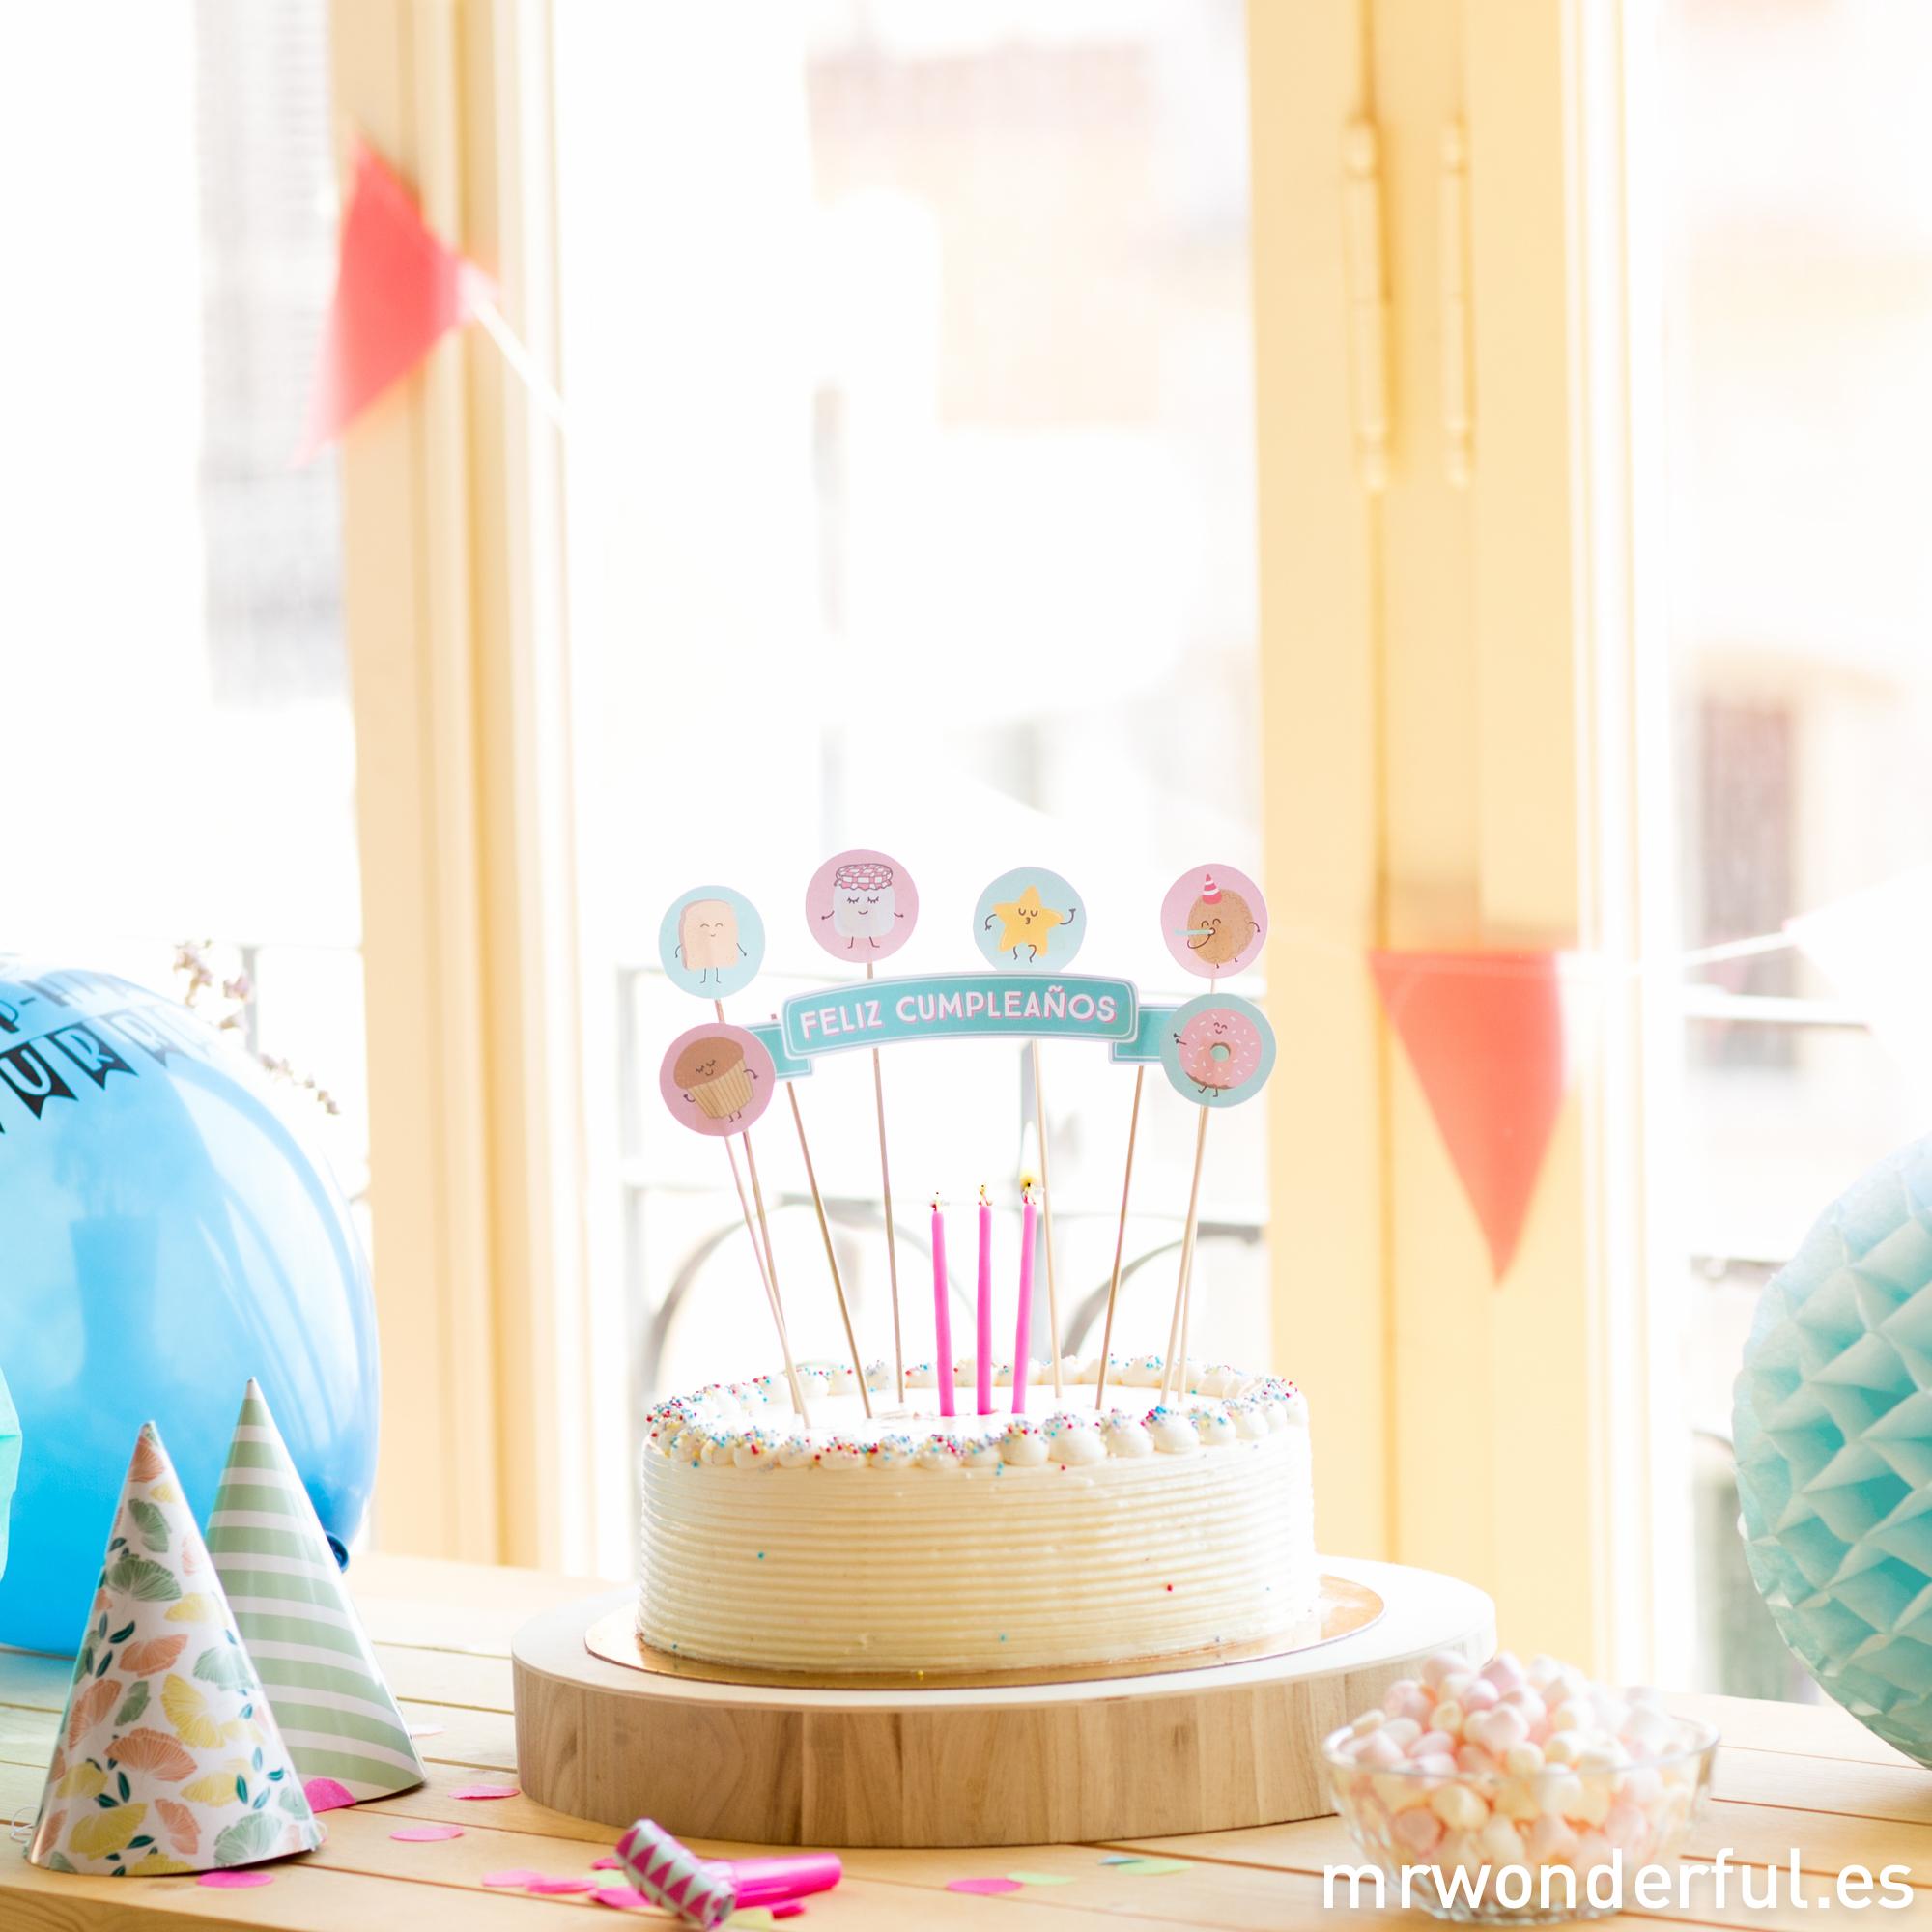 mrwonderful_celebracion-3-aniversario-shop-122-Editar